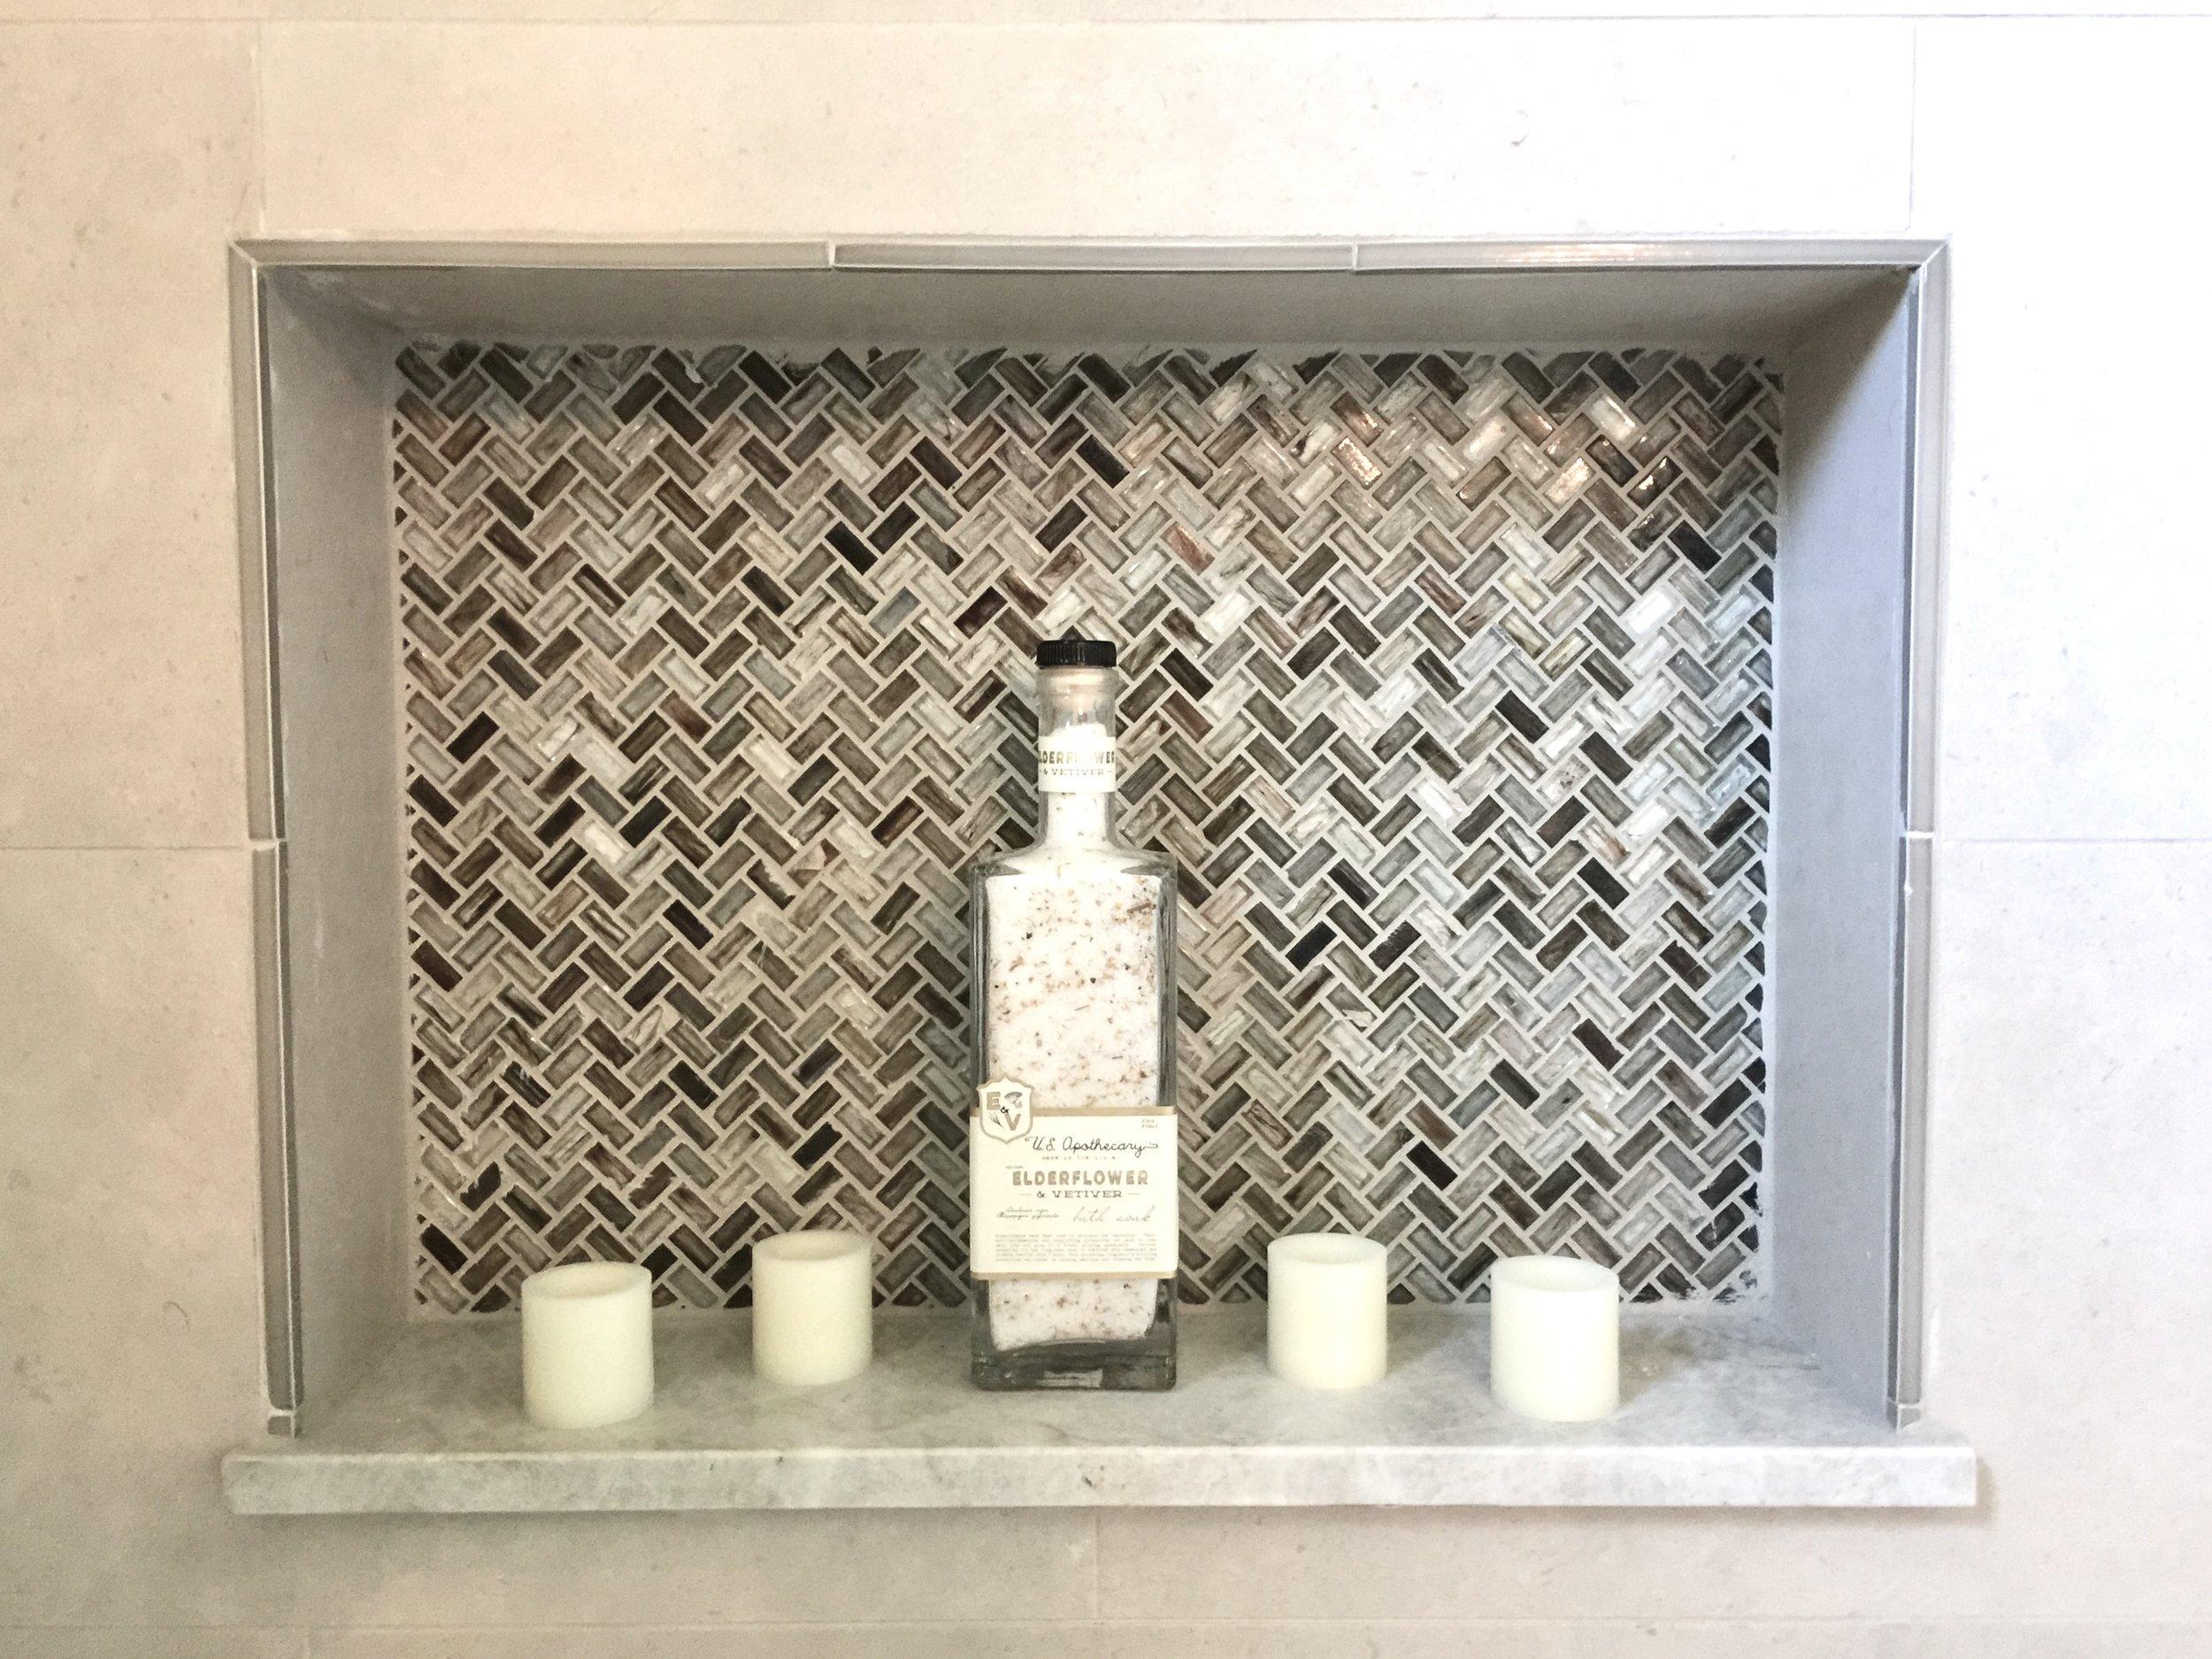 Shampoo niche with marble shelf in bathroom designed by Cristina Robinson